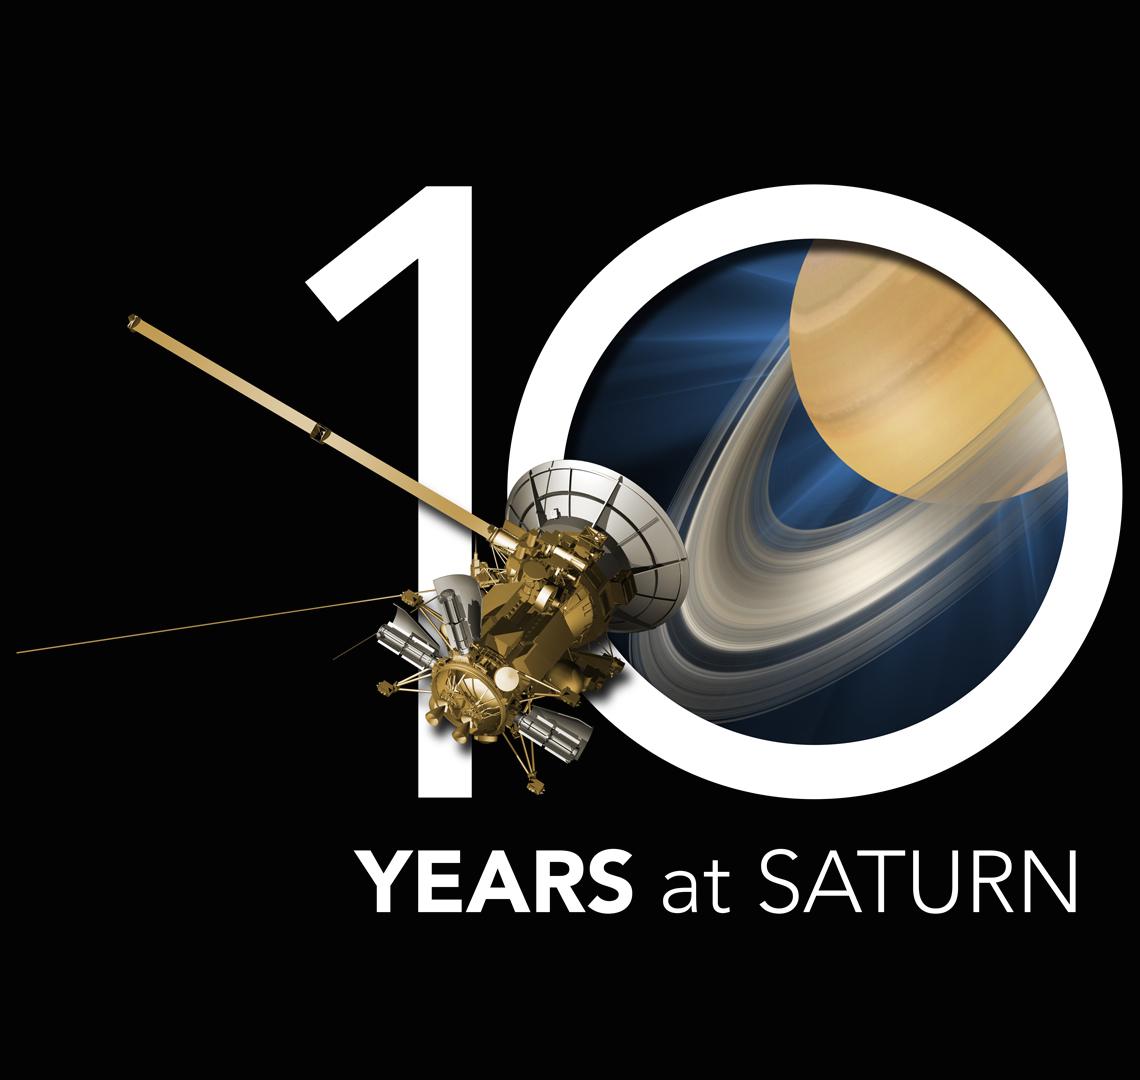 Cassini - 10 YEARS at SATURN; Quelle: NASA/JPL-Caltech